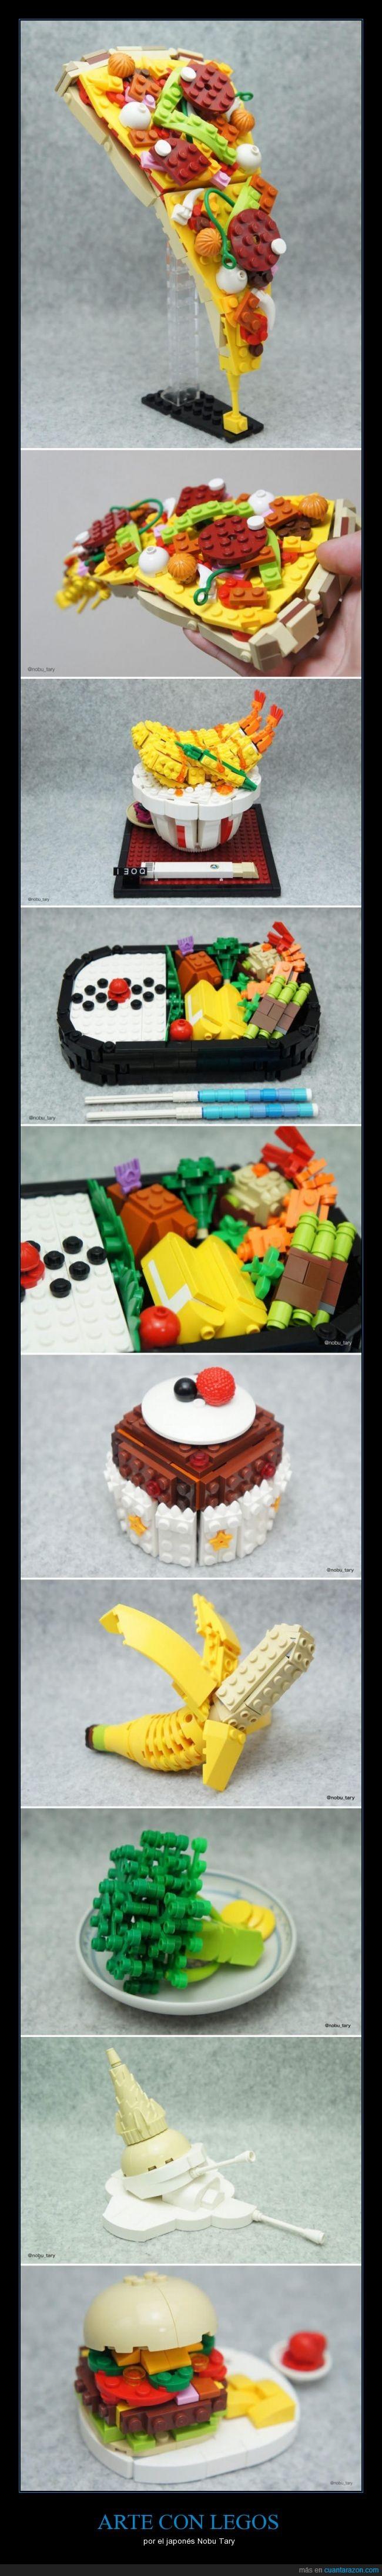 arte,brocoli,Comida,hamburguesa,legos,plátano